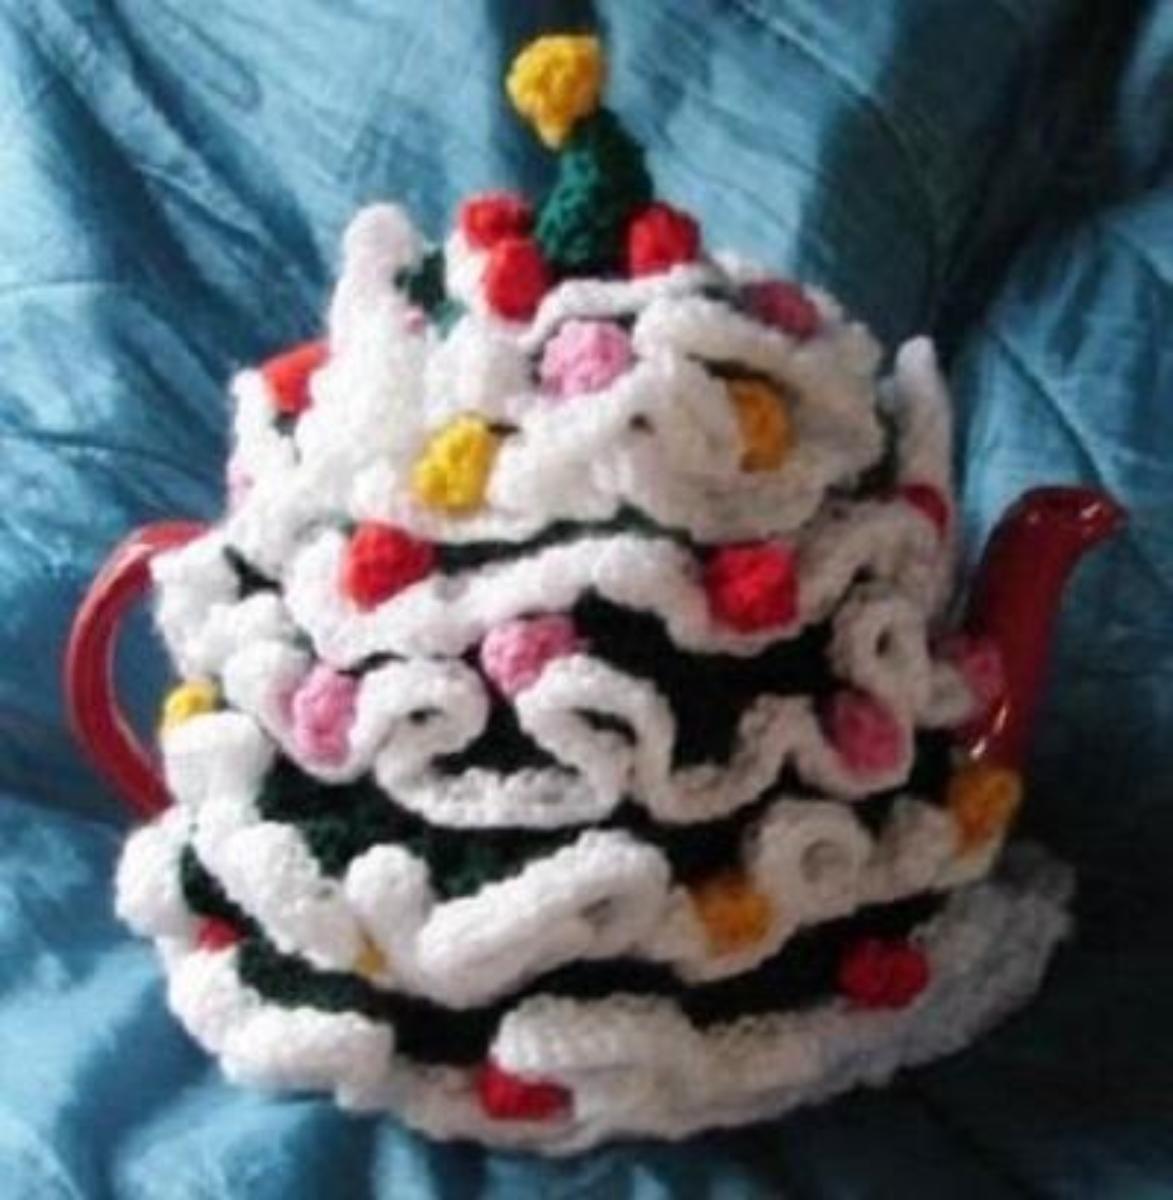 Christmas tree tea cosy knitting pattern tea cosy knitting christmas tree tea cosy knitting pattern bankloansurffo Choice Image